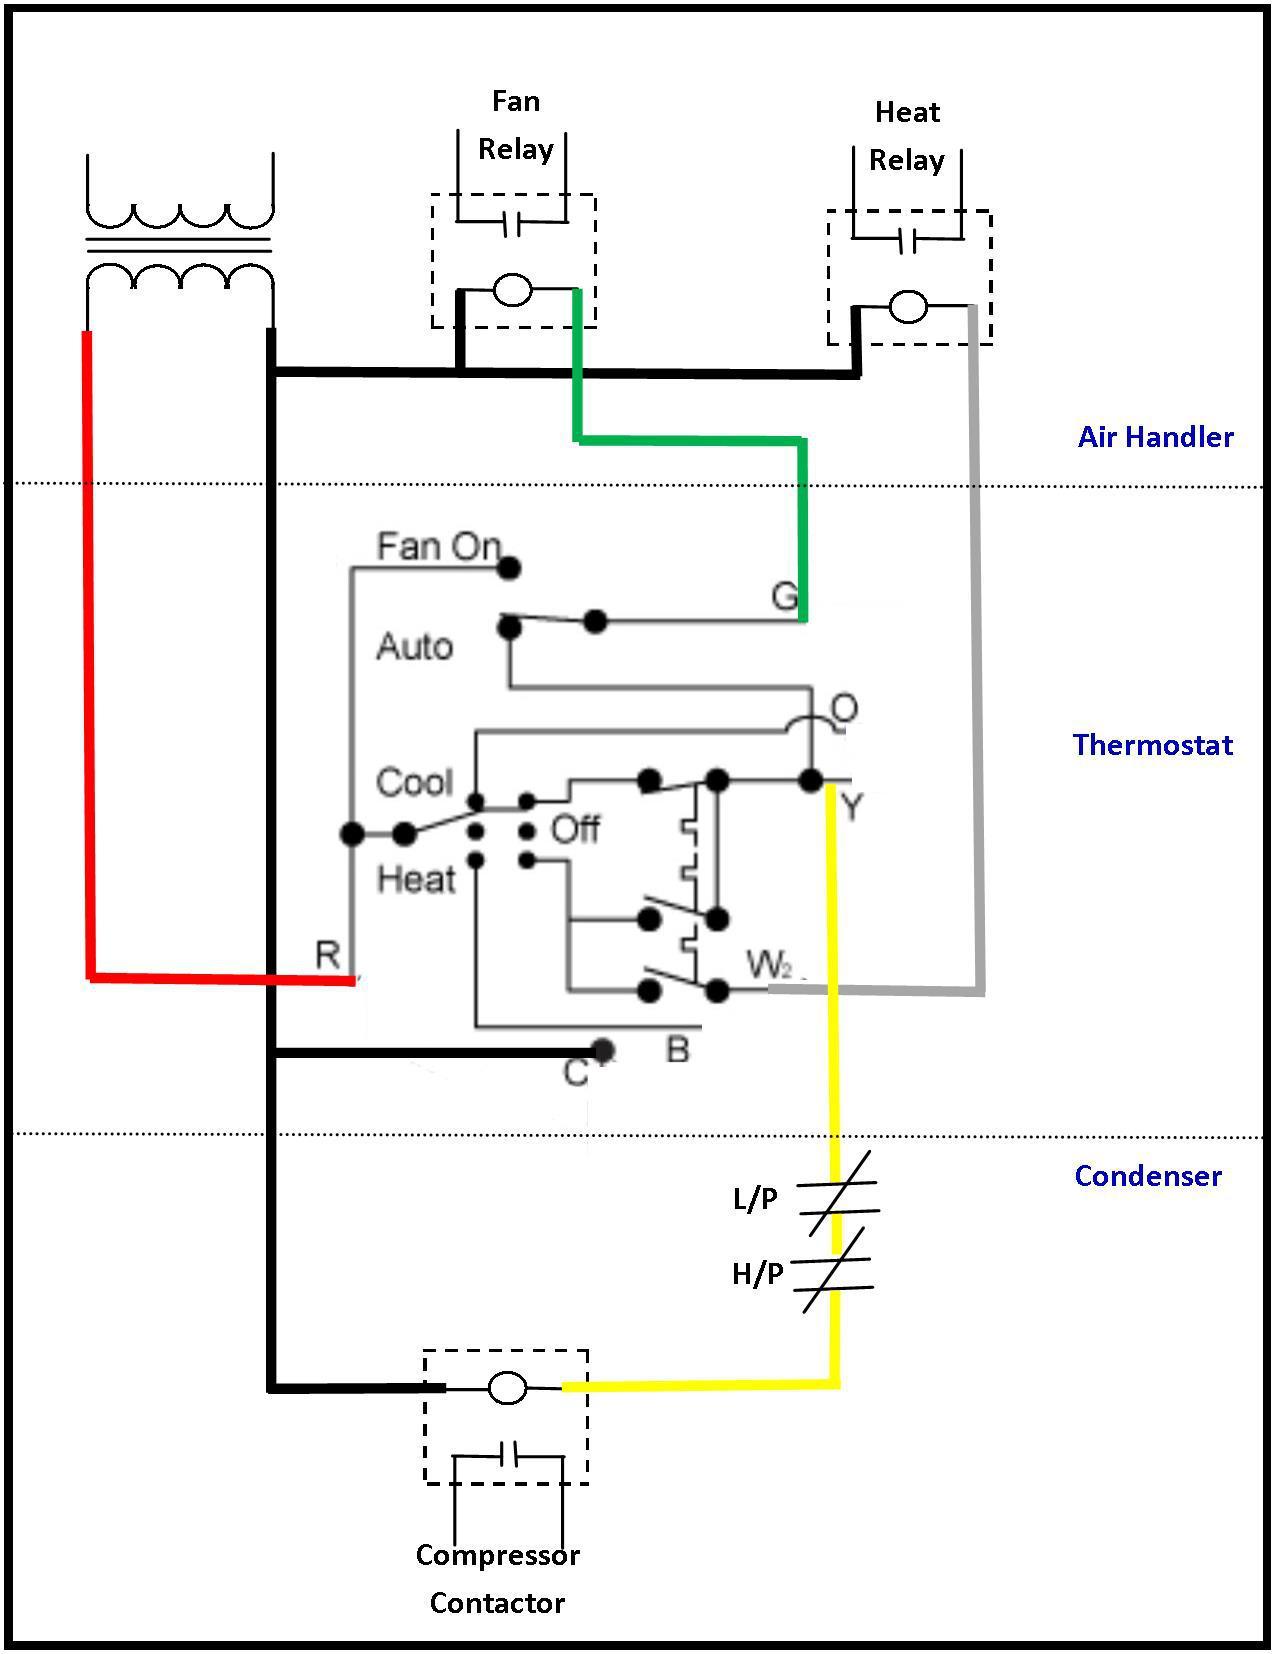 altronix relays wiring diagrams ya 8764  rr7 relay wiring diagram  ya 8764  rr7 relay wiring diagram